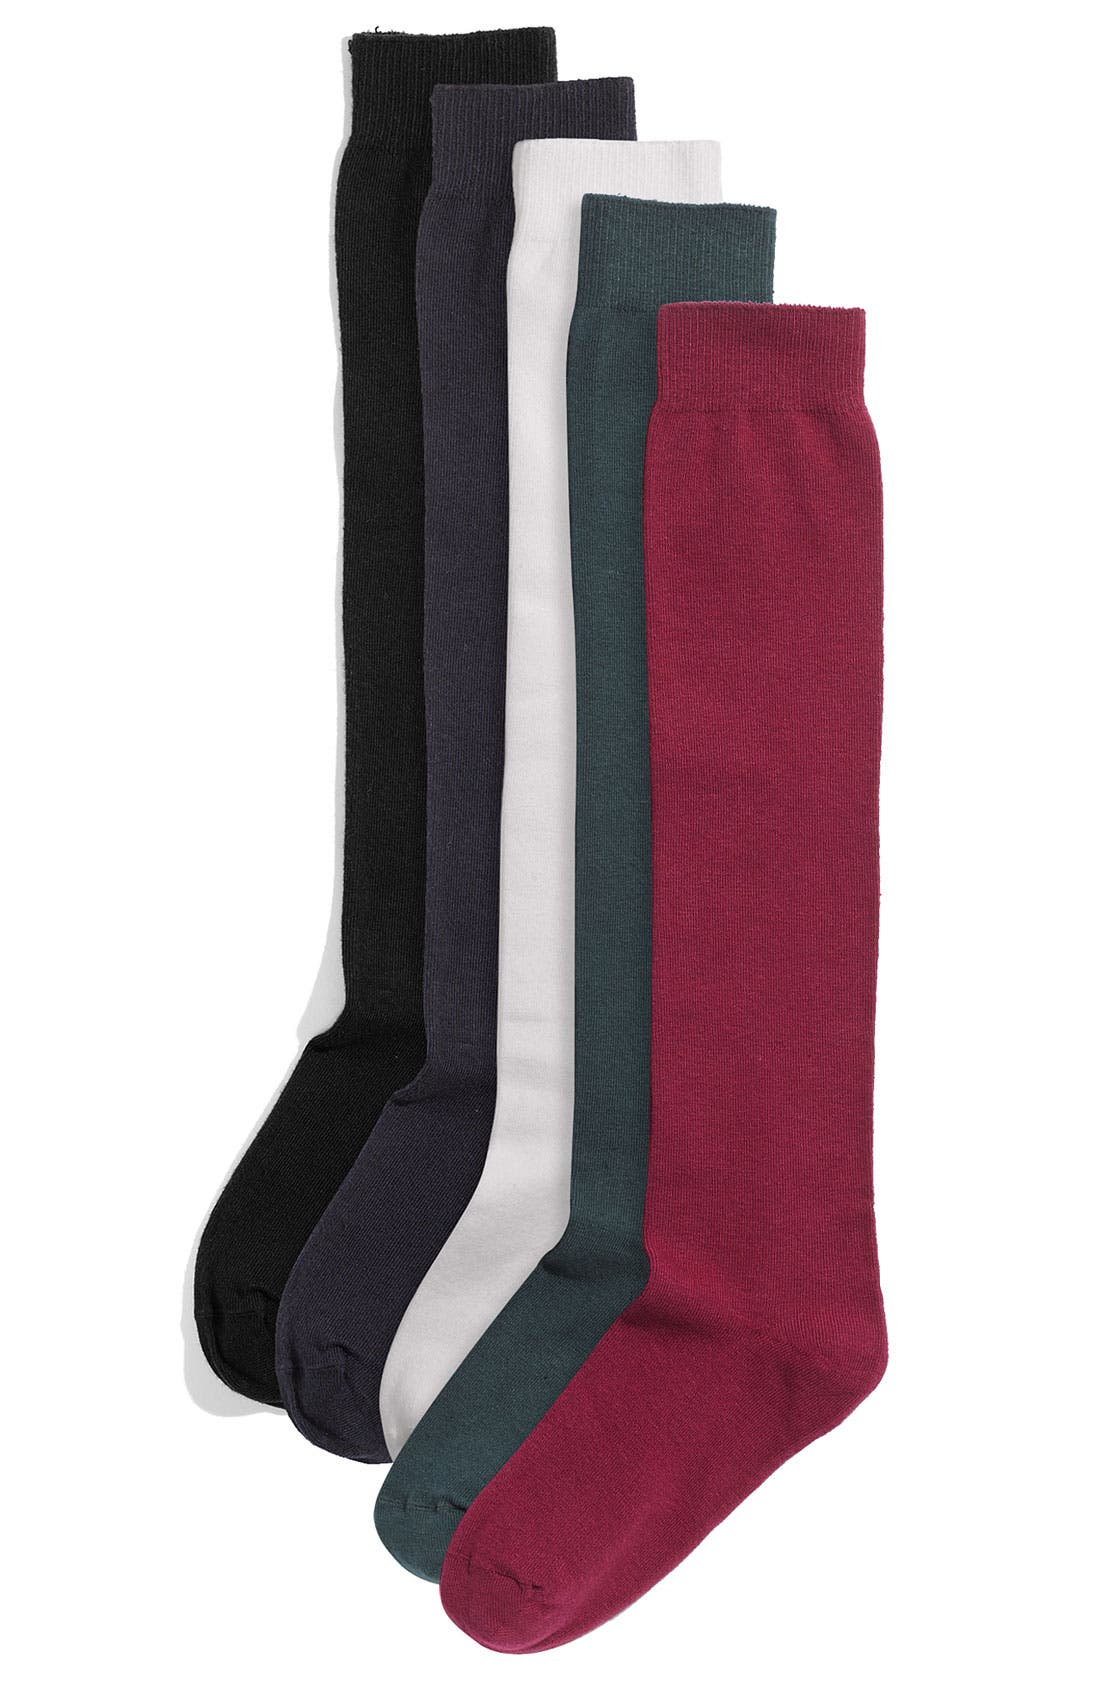 Flat Knit Knee Socks,                             Main thumbnail 1, color,                             088